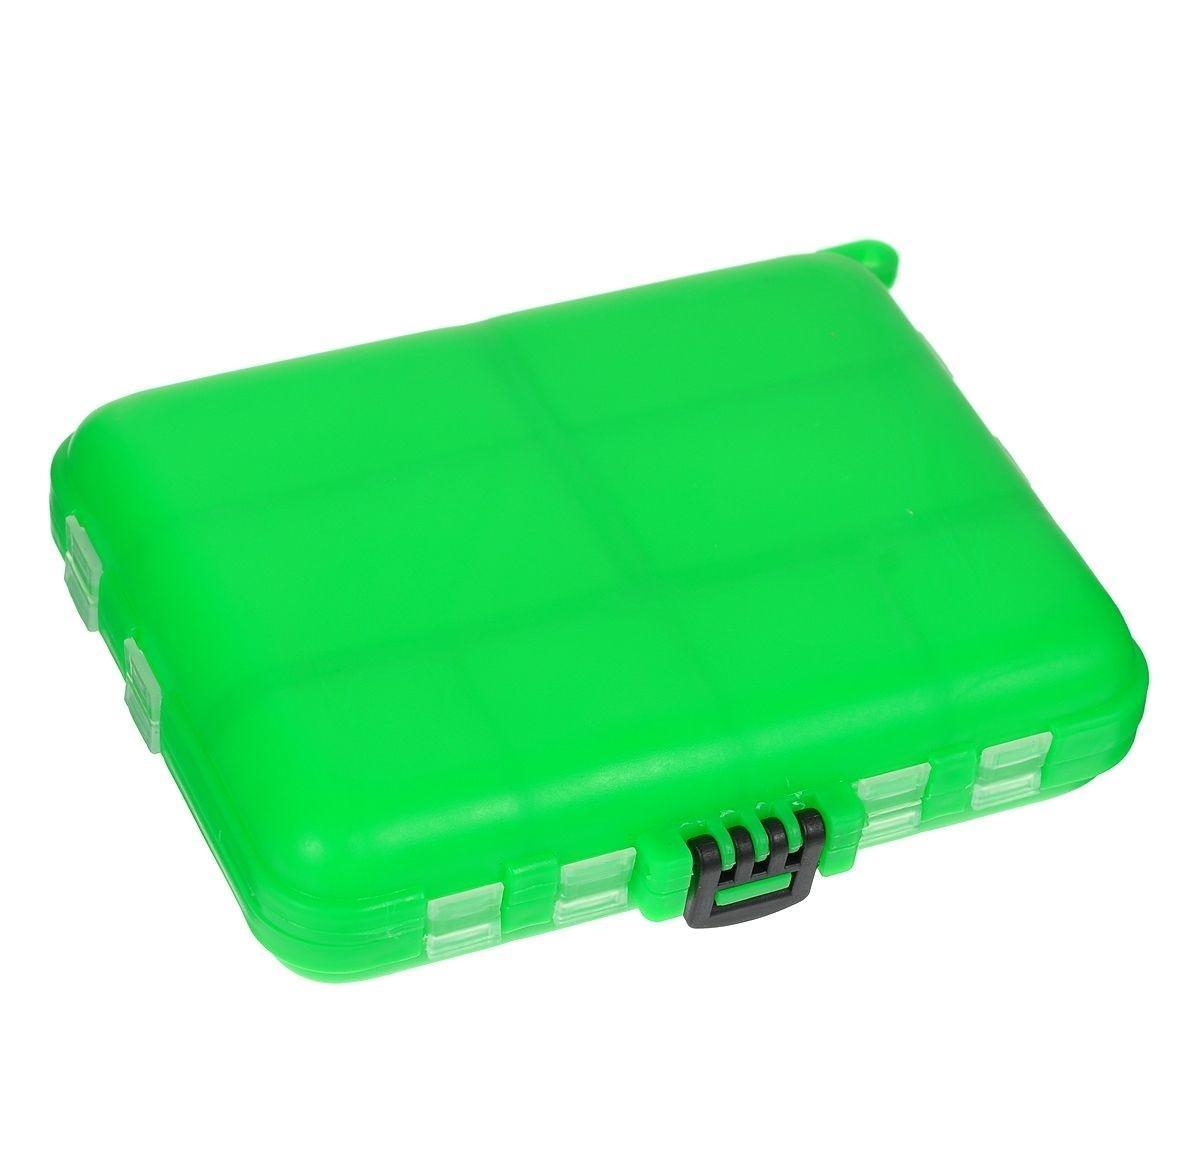 Органайзер для мелочей,, двухсторонний, цвет: зеленый, серый, 12 см х 10 см х 2,5 см коробка для приманок три кита сч 5